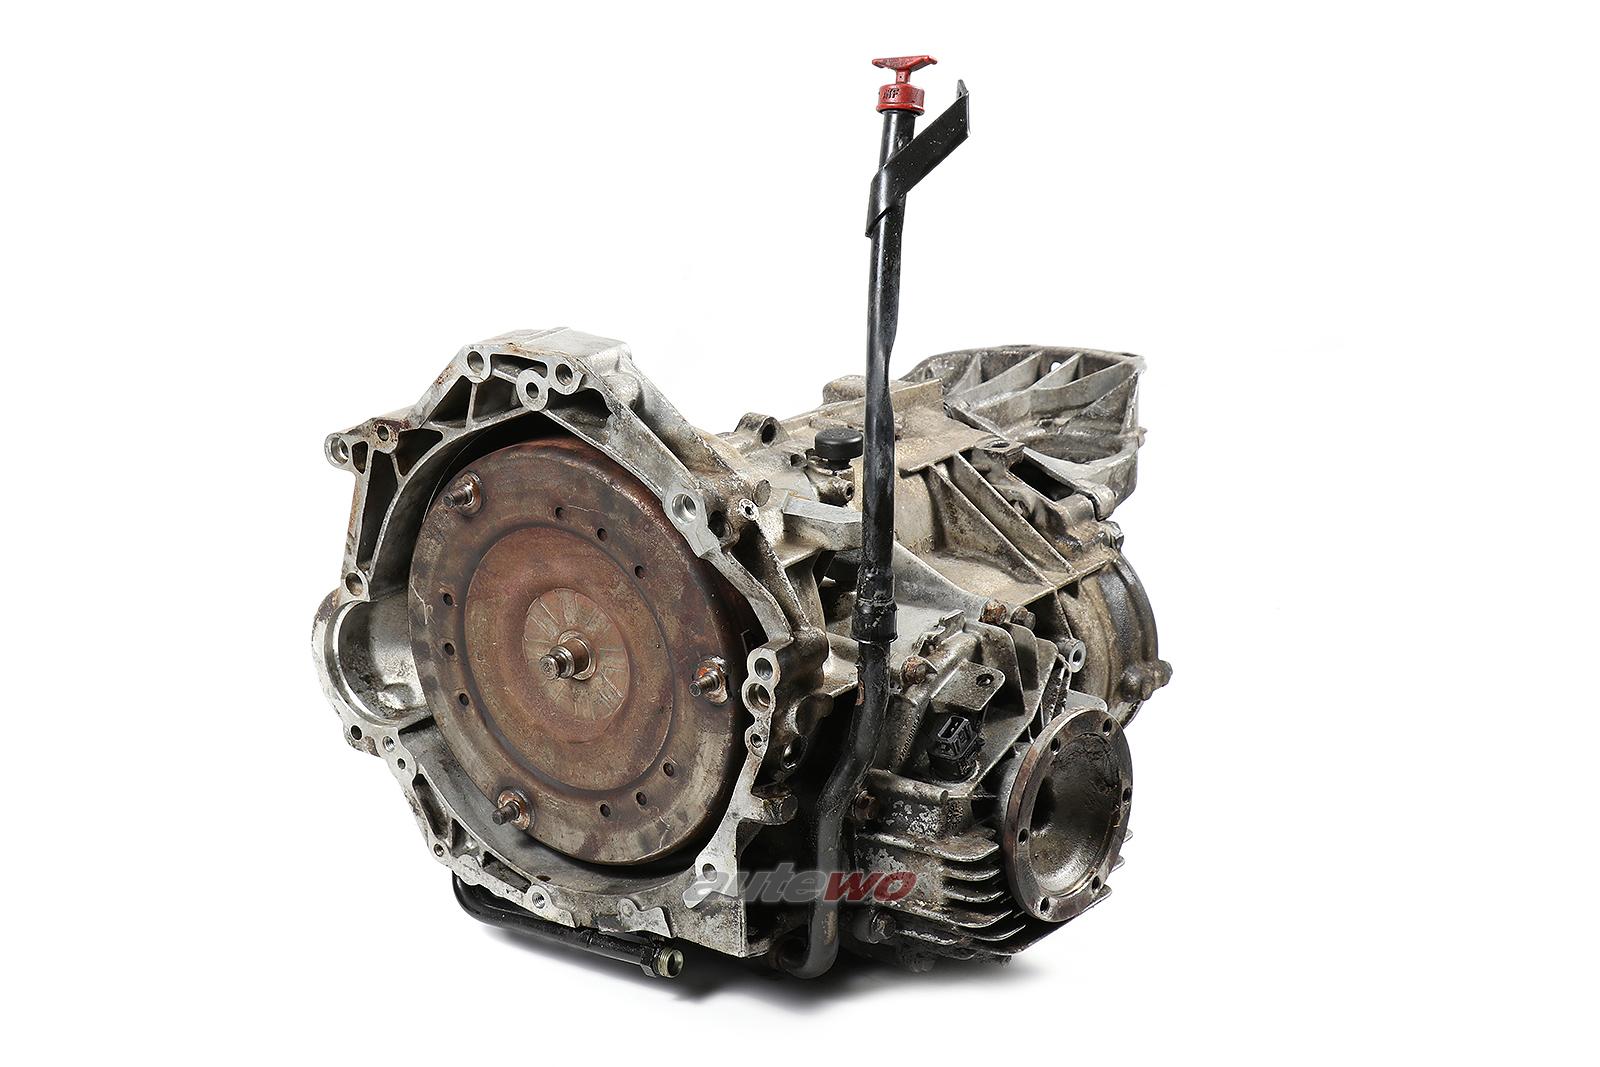 097300036PX Audi 80 B4/Coupe/Cabrio 2.6l V6 Automatikgetriebe CFY 18014 178000km